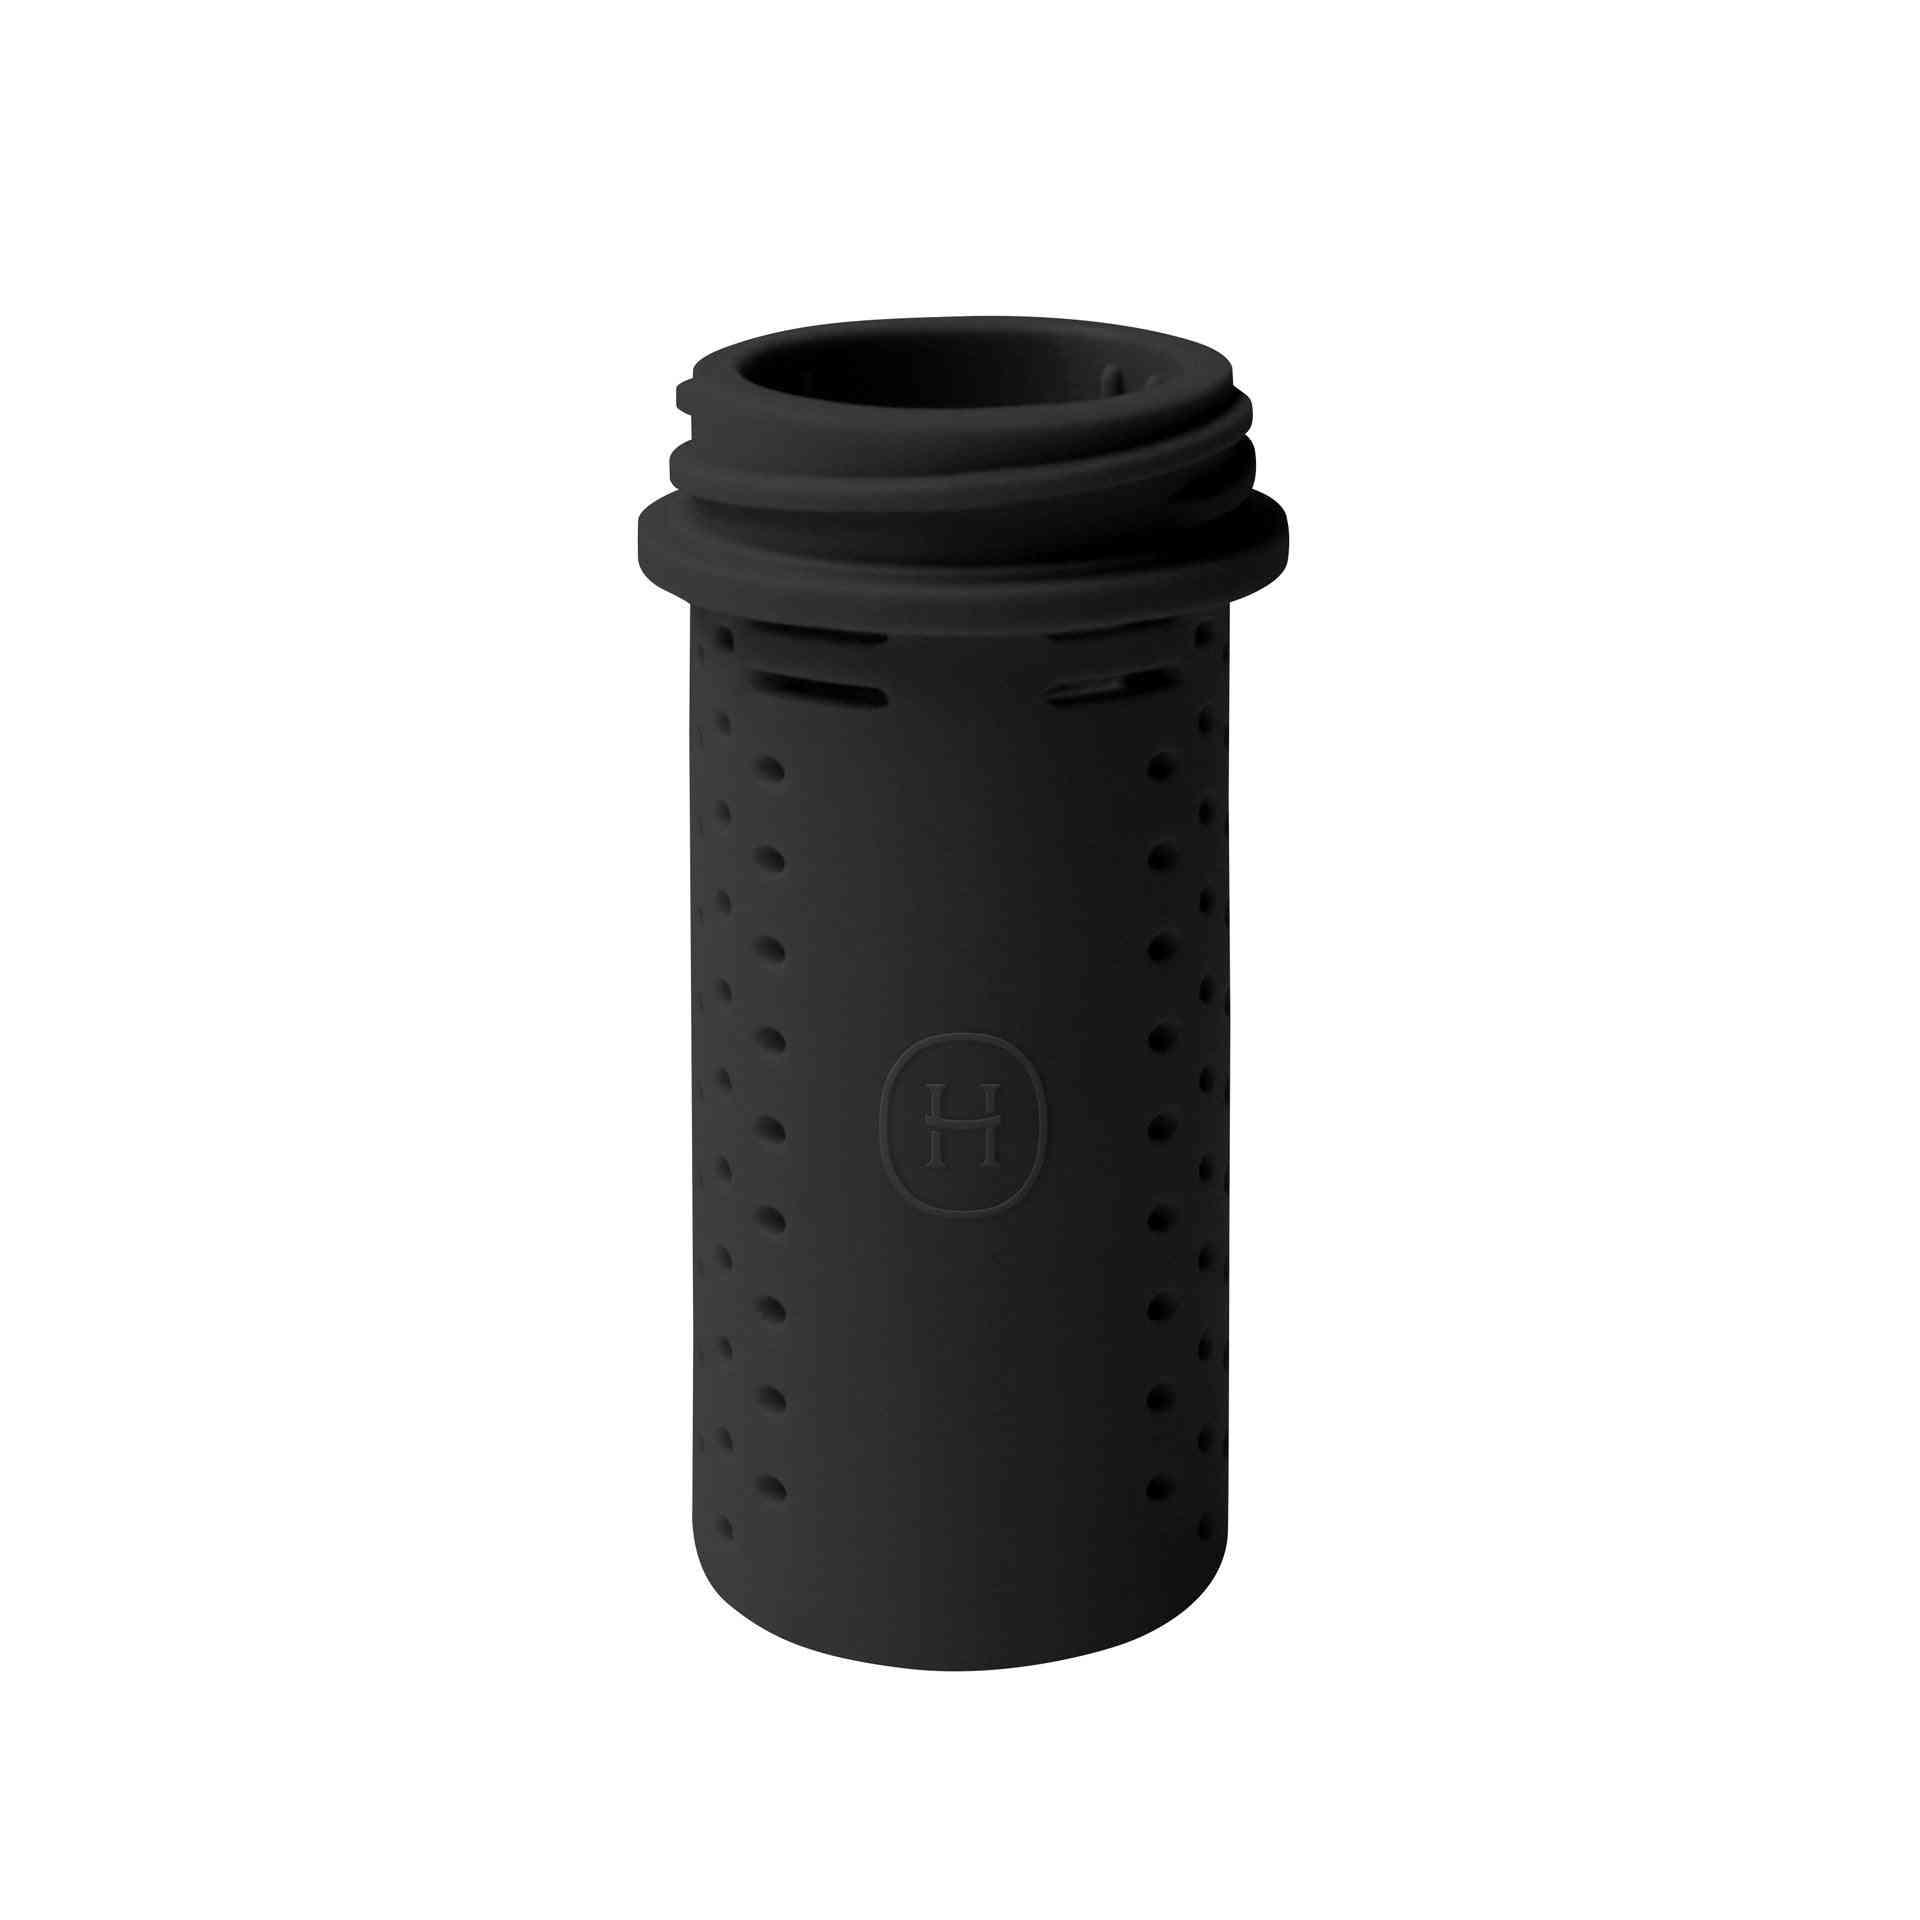 Black Bottle Shaped Silicone Tea Infuser